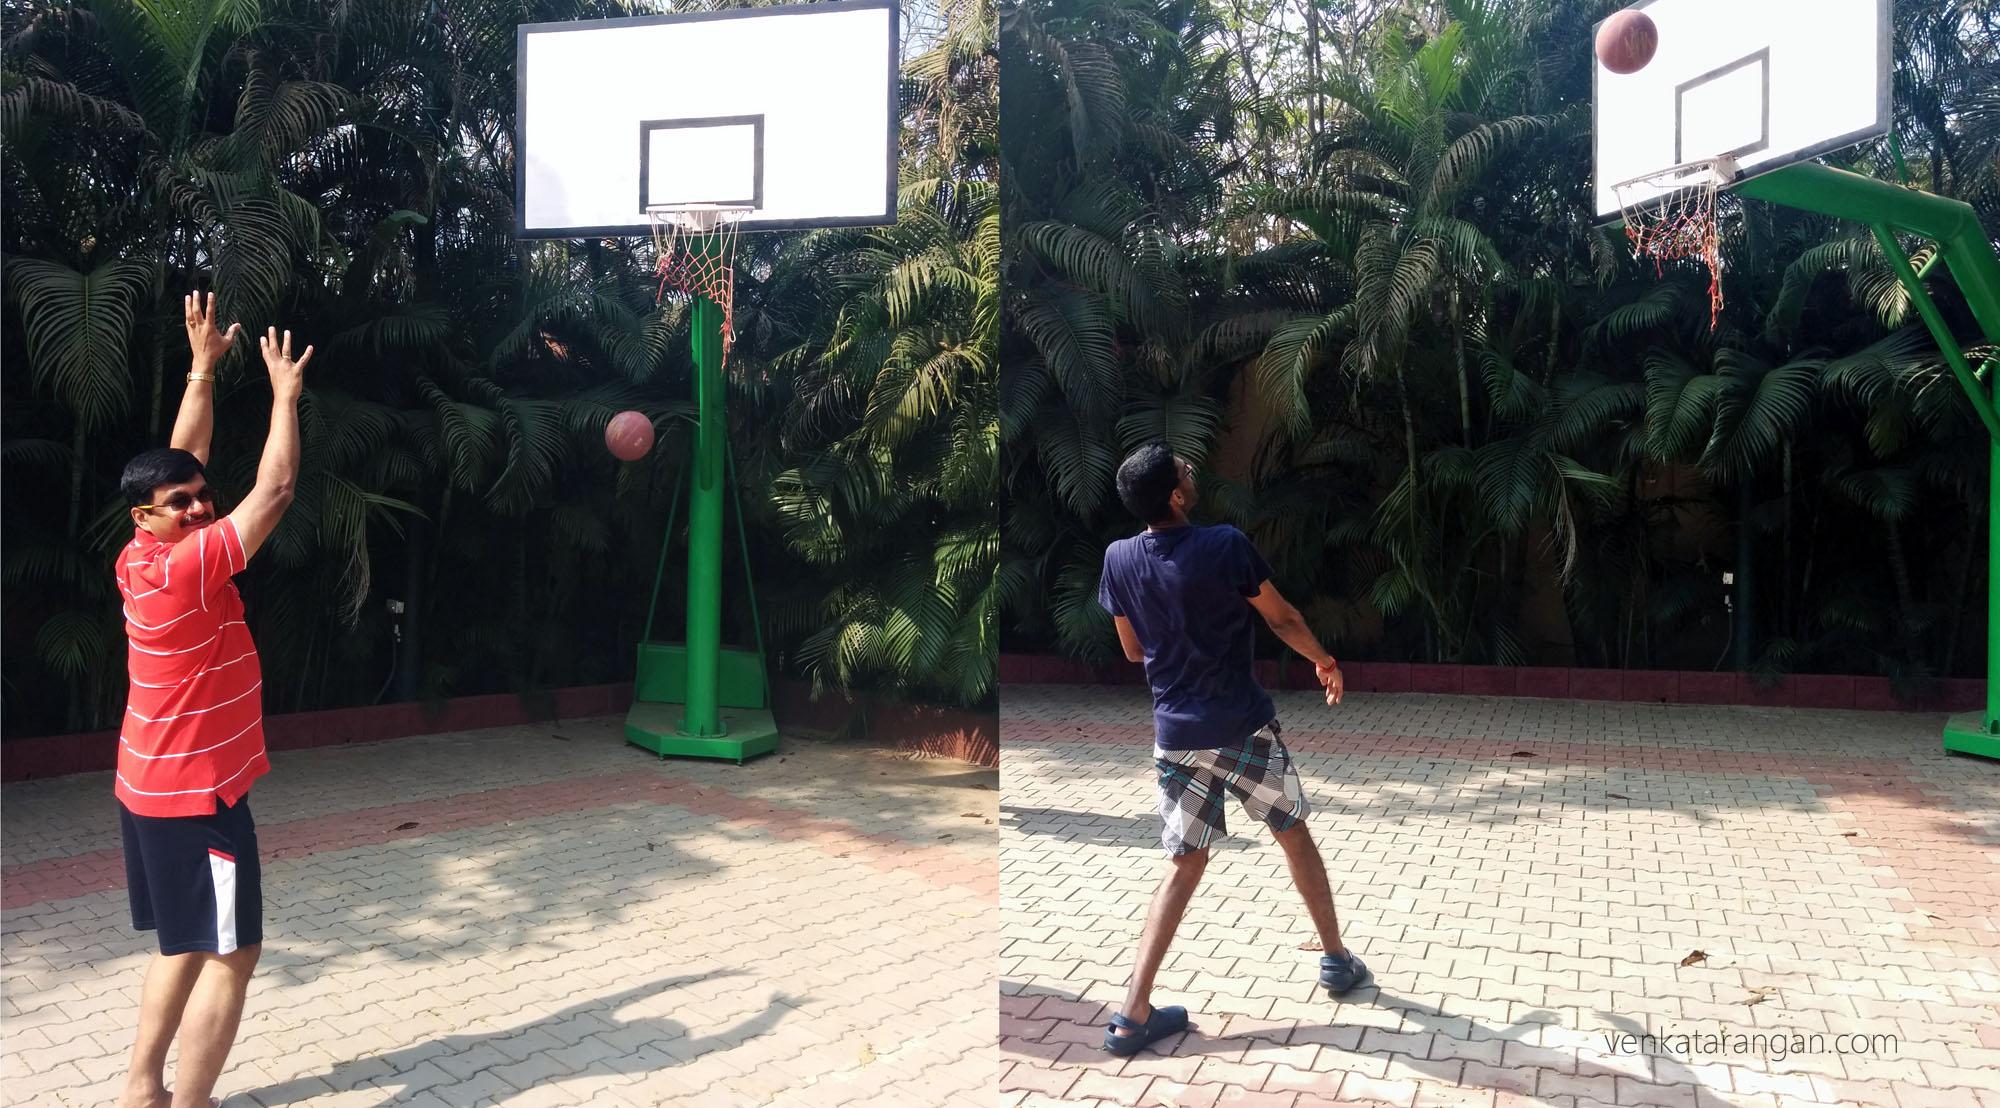 Mayfair Lagoon, Bhubaneswar - Basket ball court